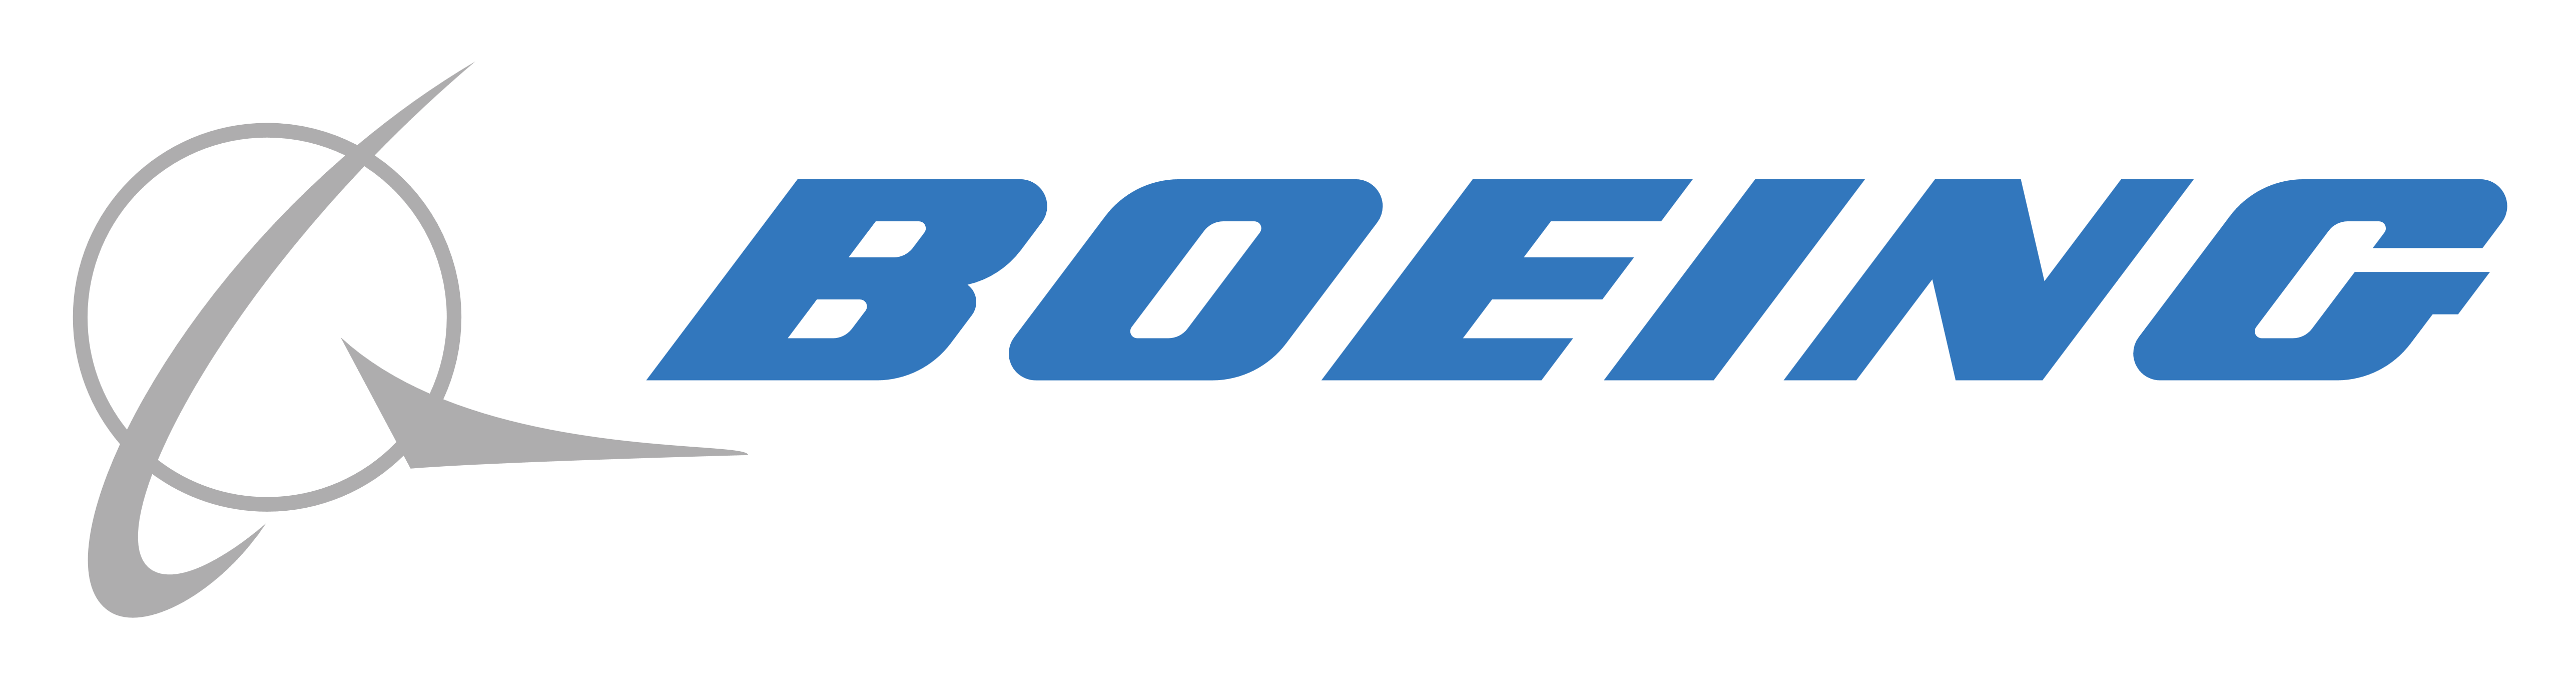 Download Boeing Logo Png - Boeing Logo, Transparent background PNG HD thumbnail